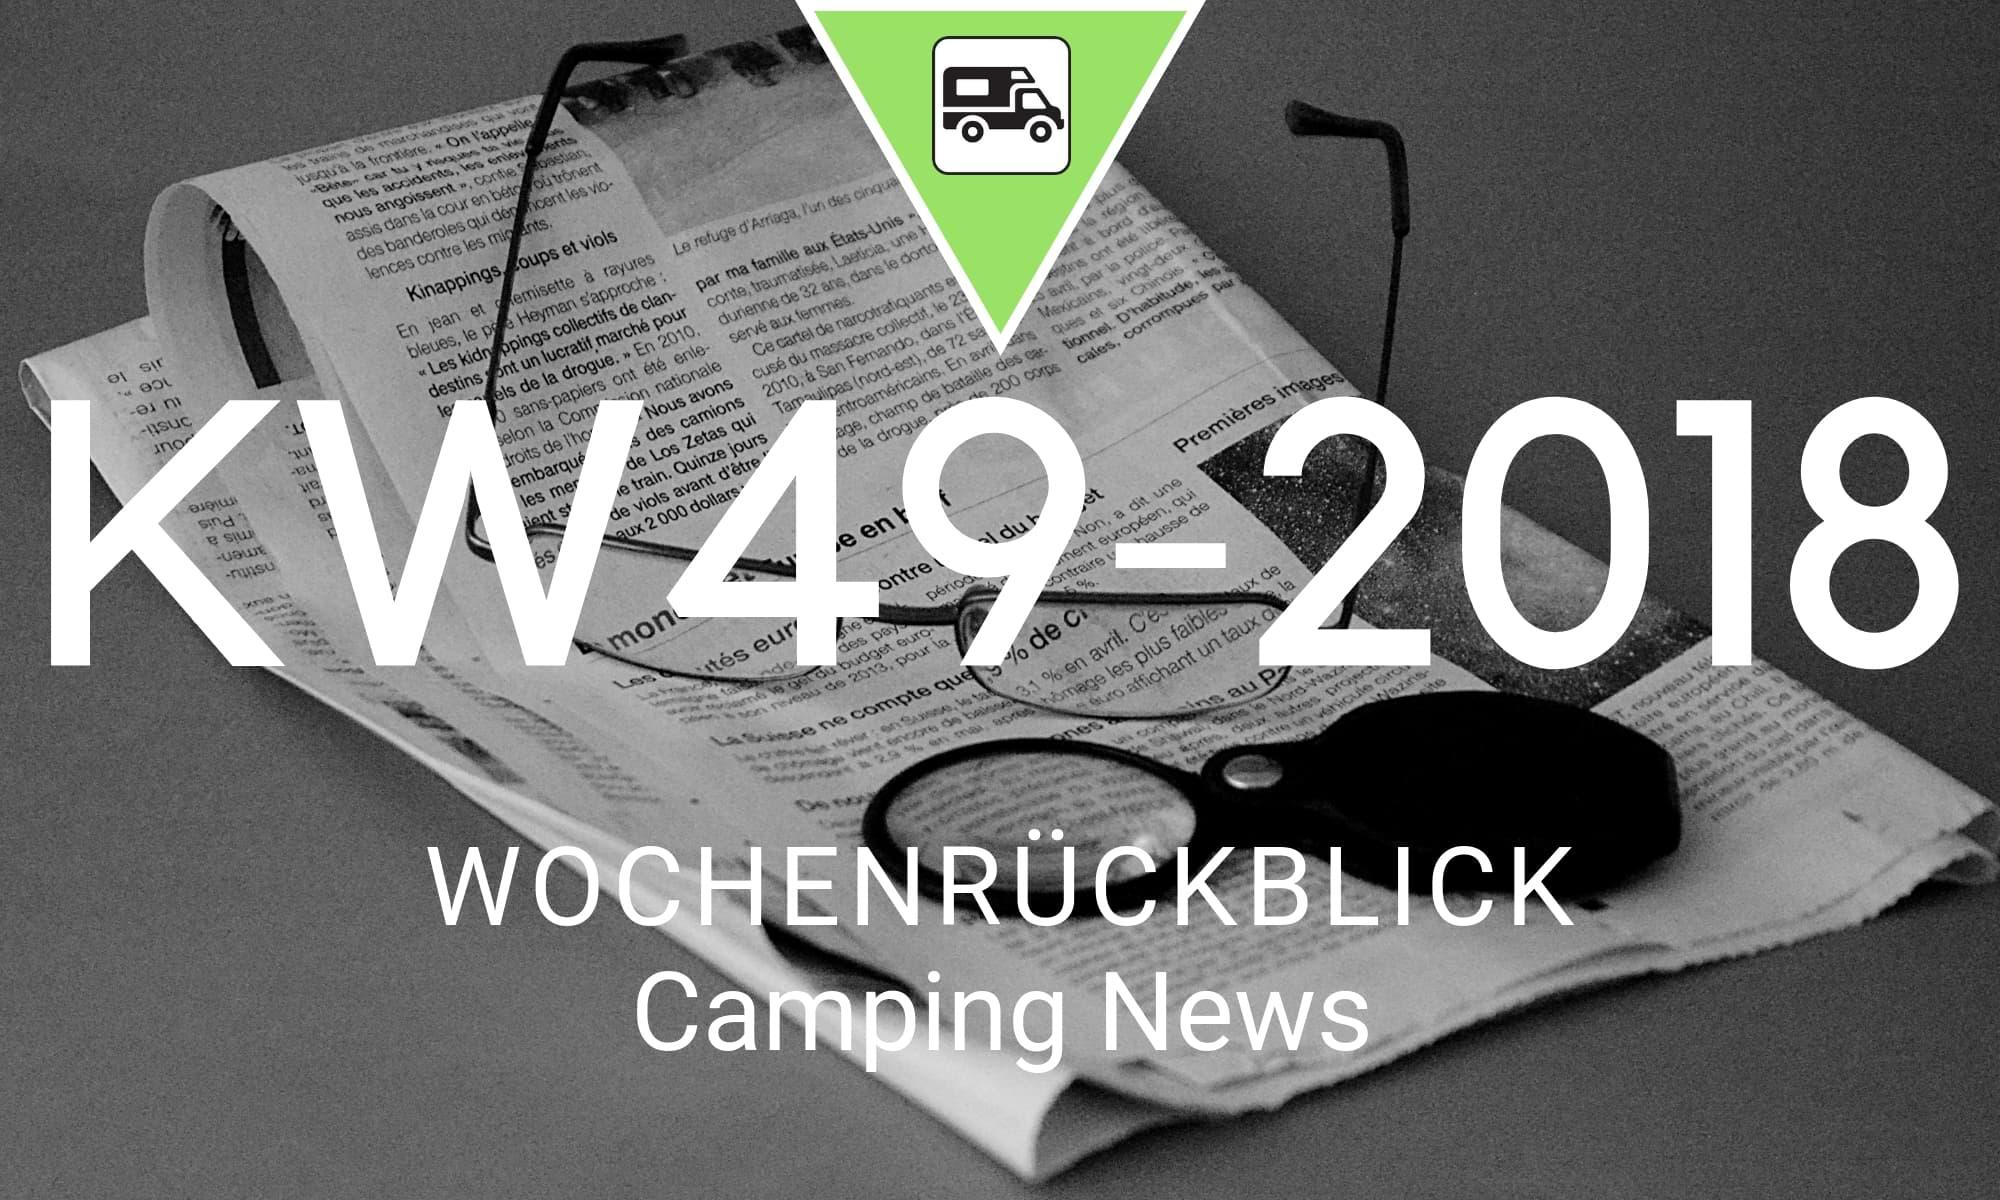 Wochenrückblick Camping News KW49-2018